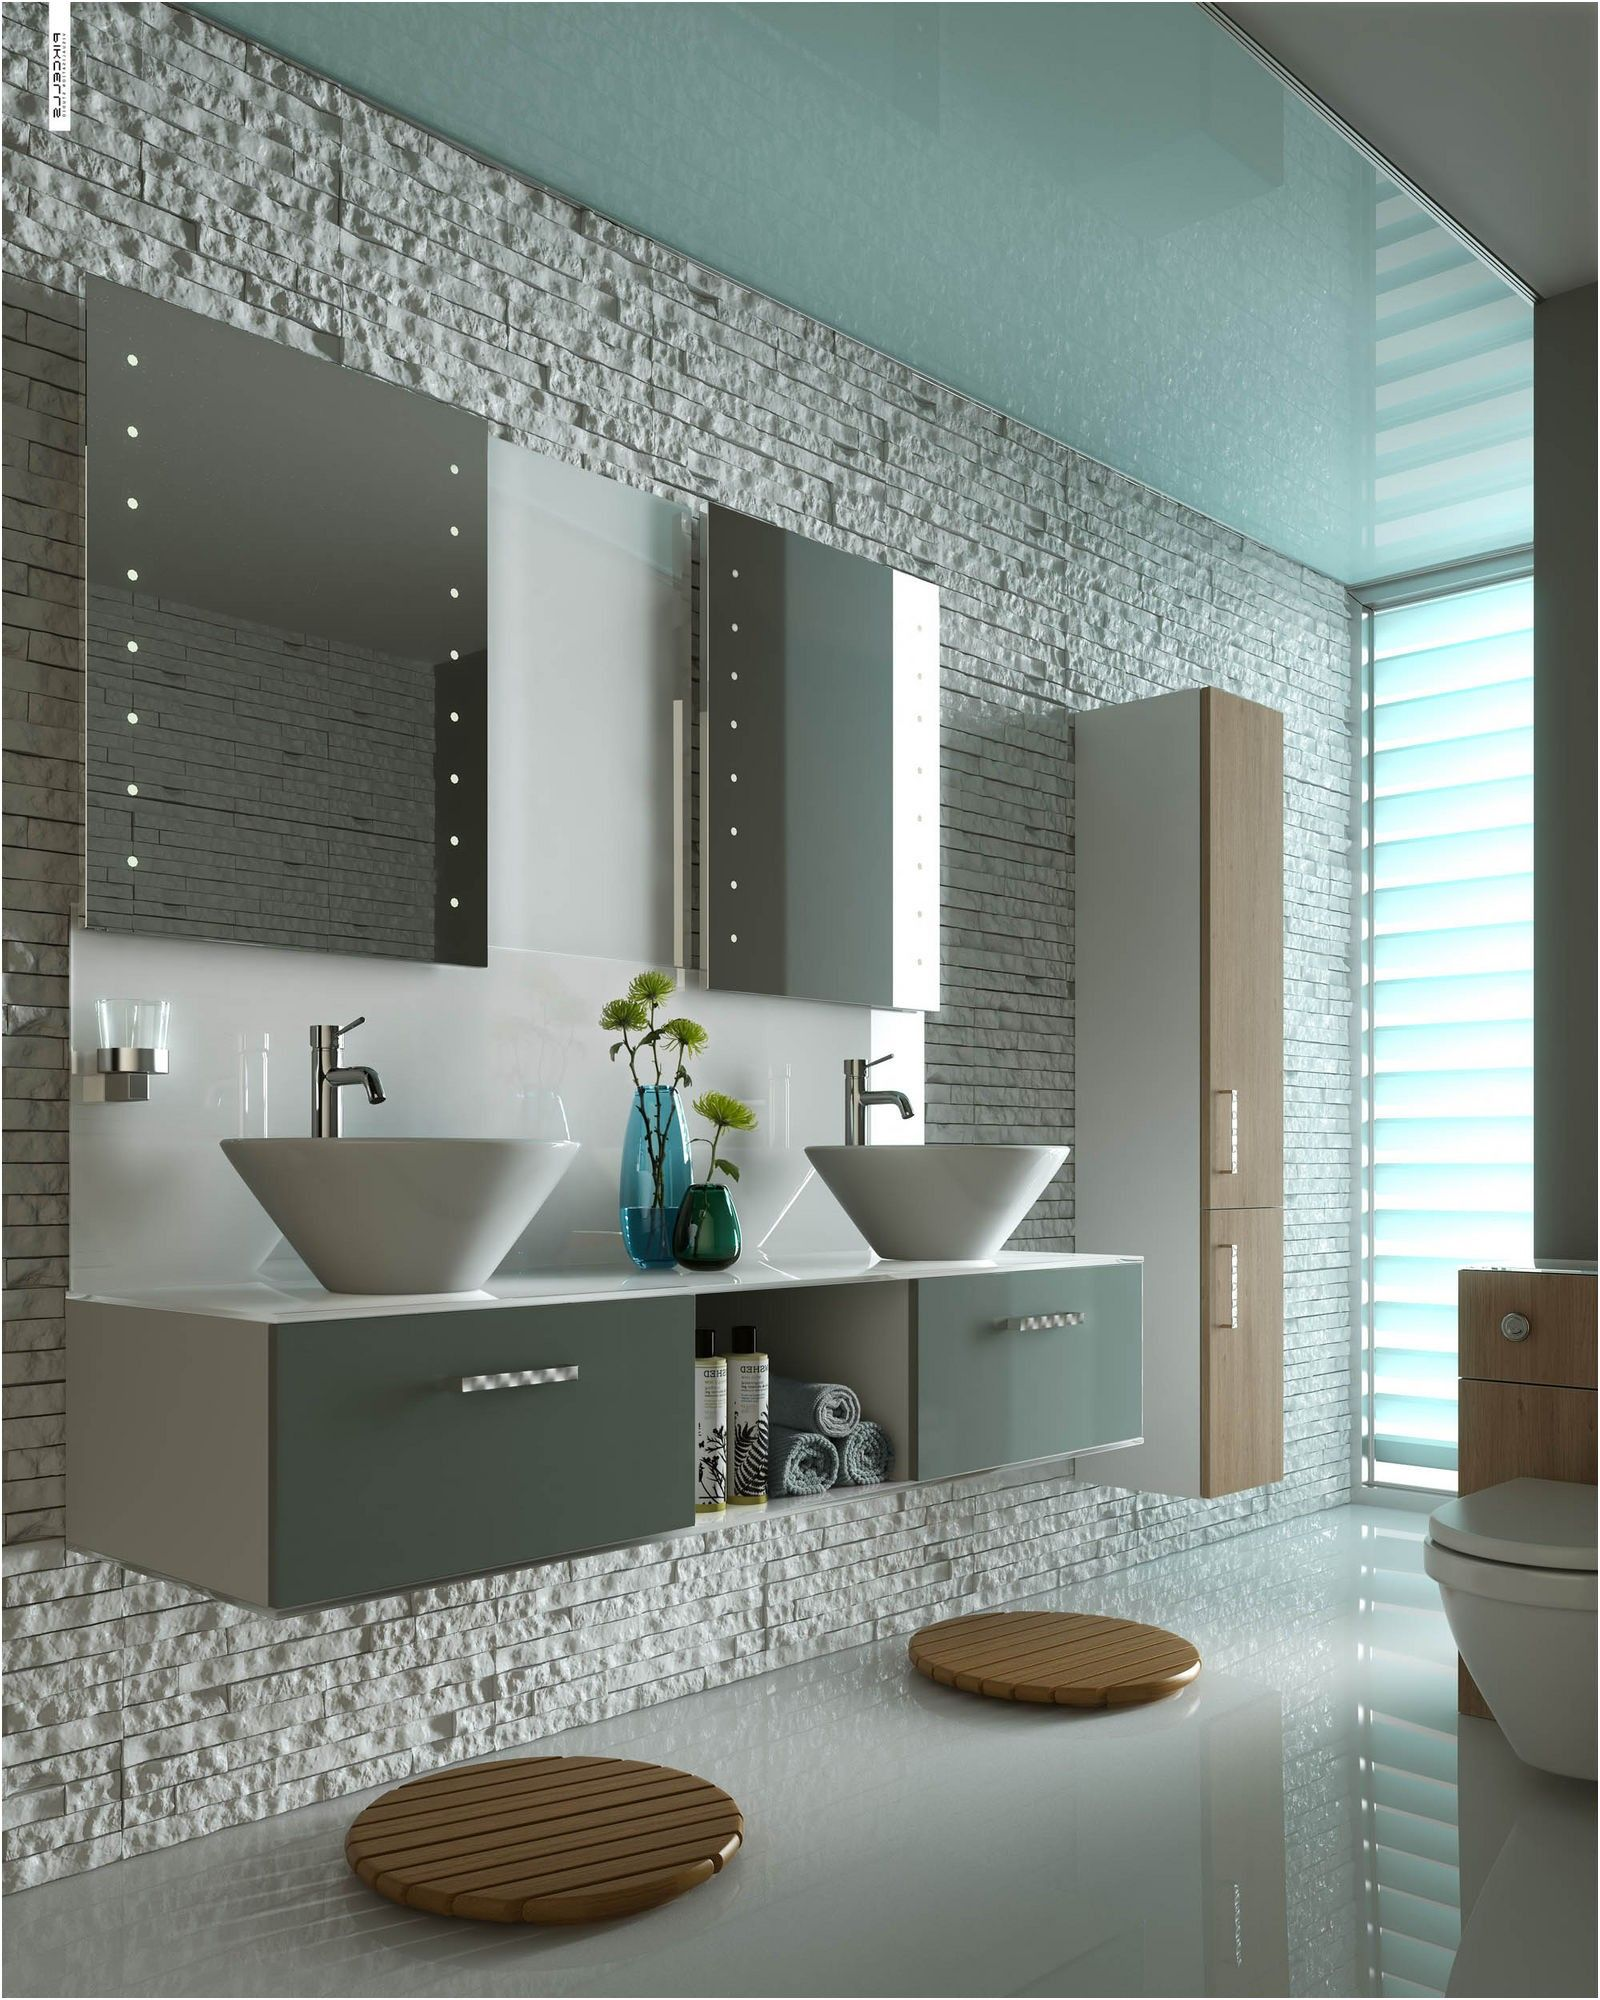 nice bathroom designs home design ideas from